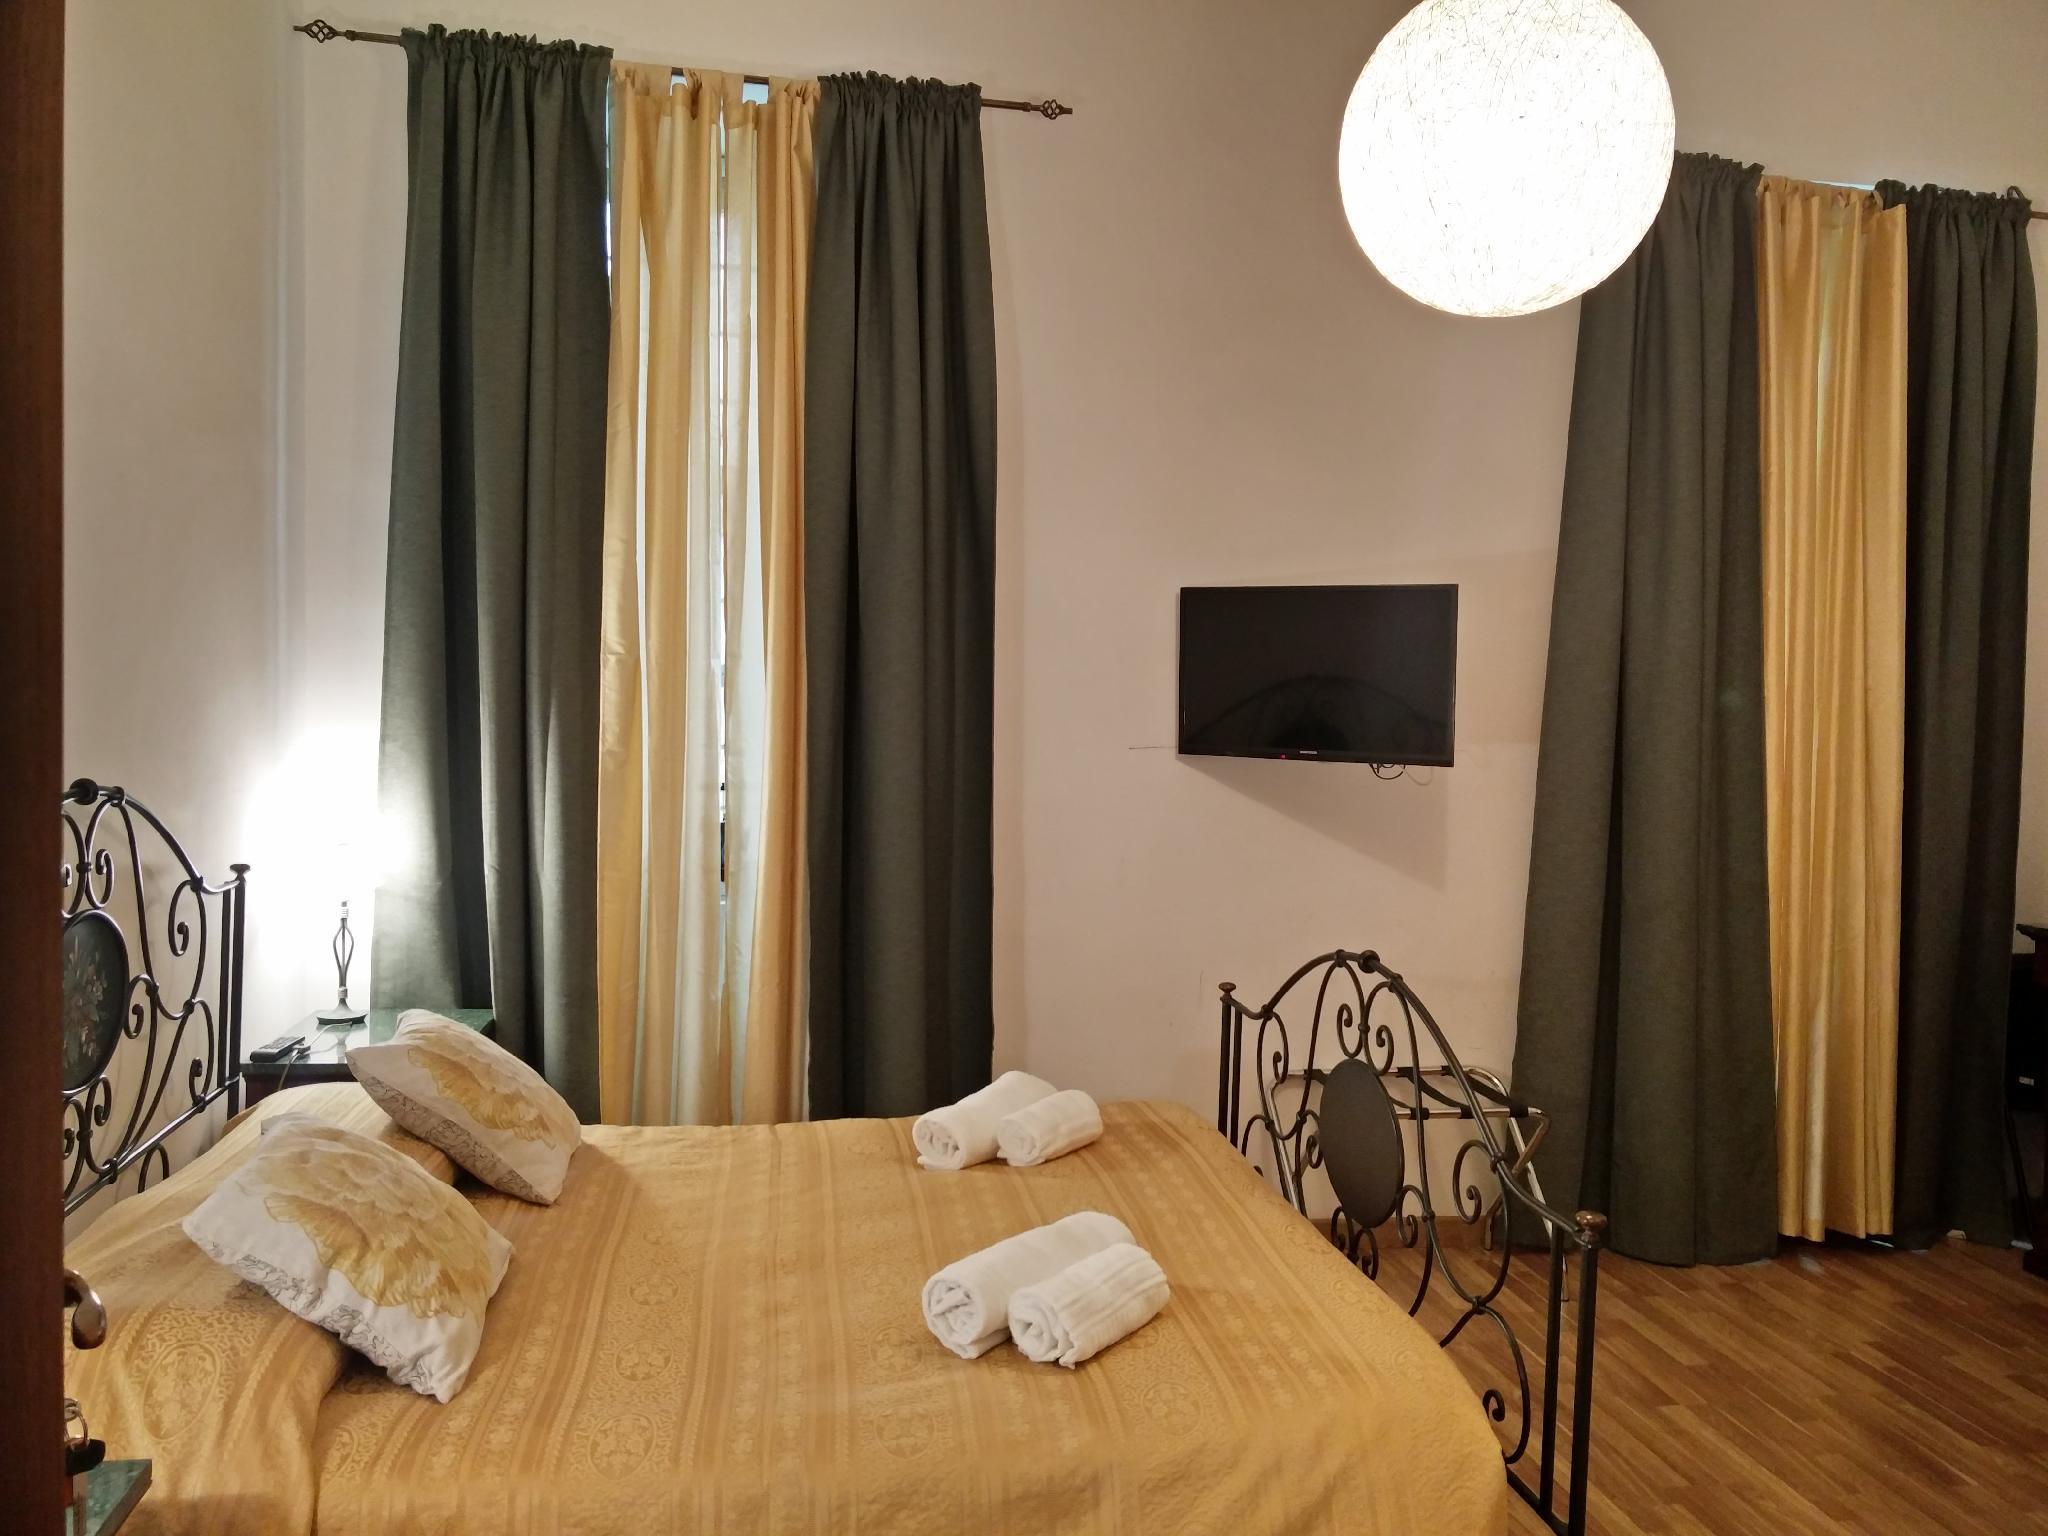 Rome Center Rooms